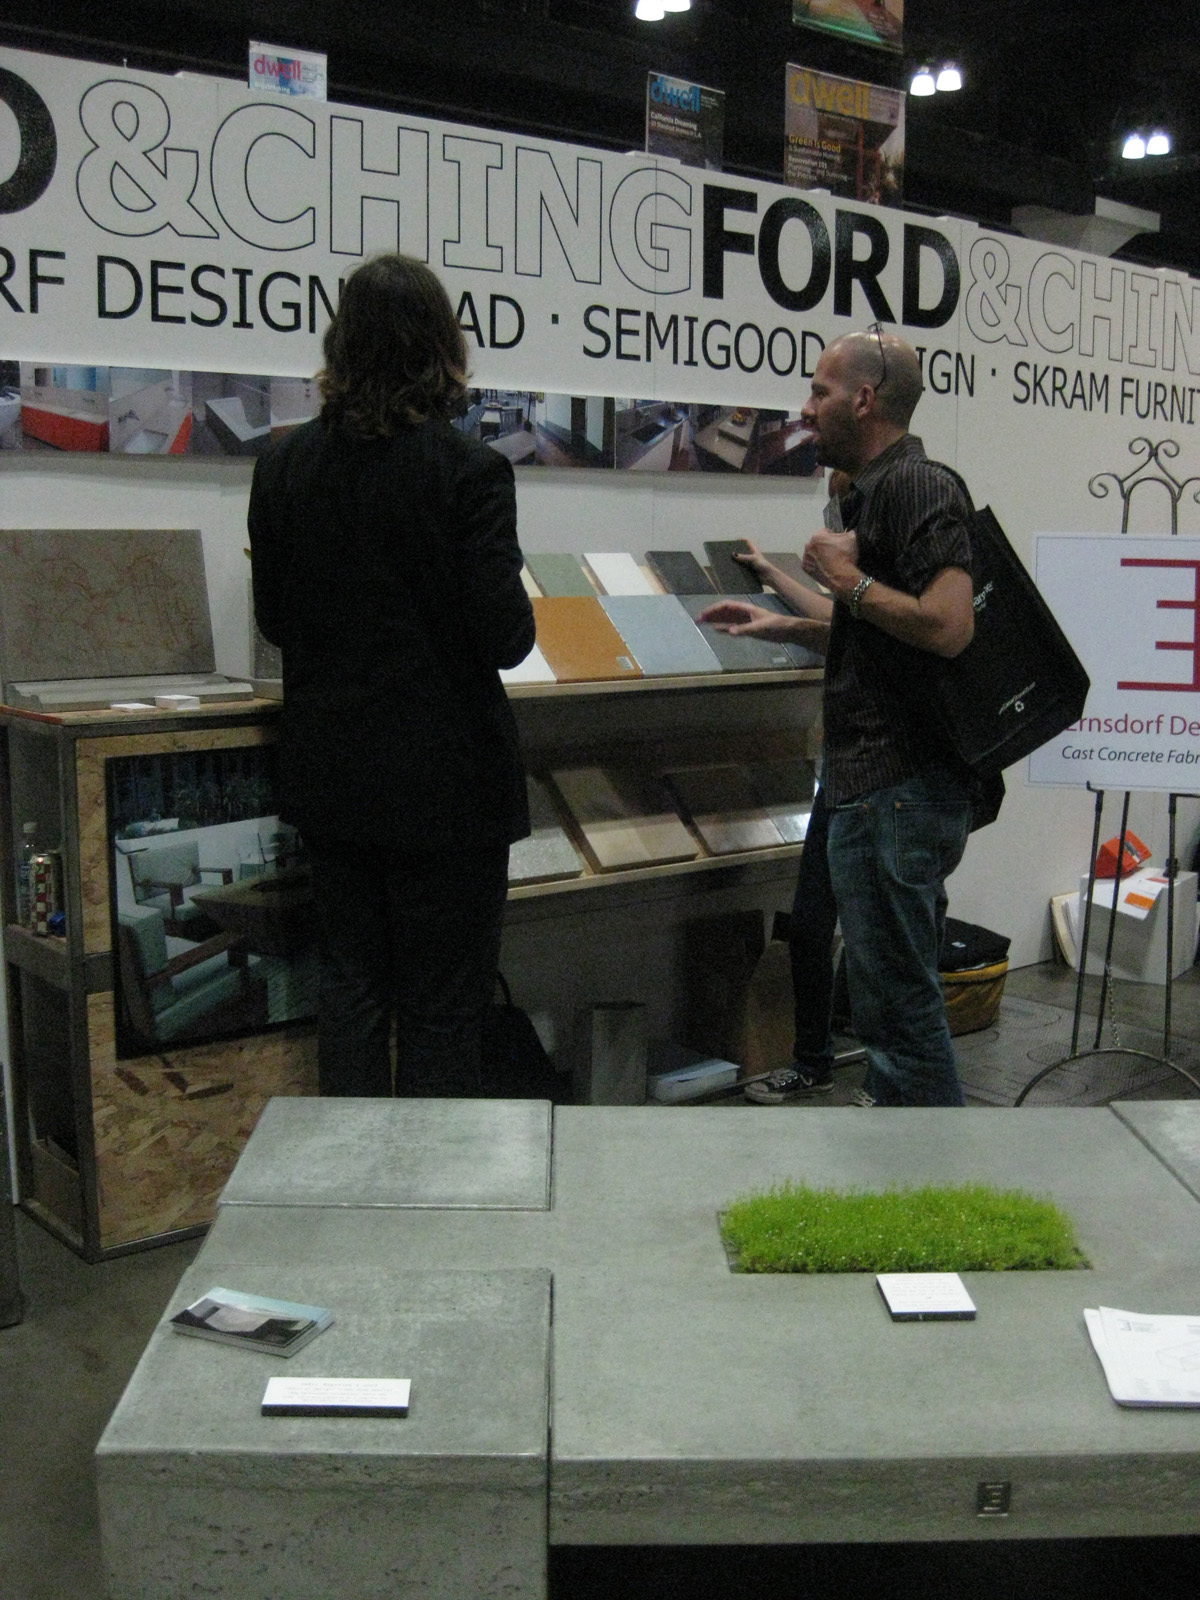 Ernsdorf Design dwell on design concrete